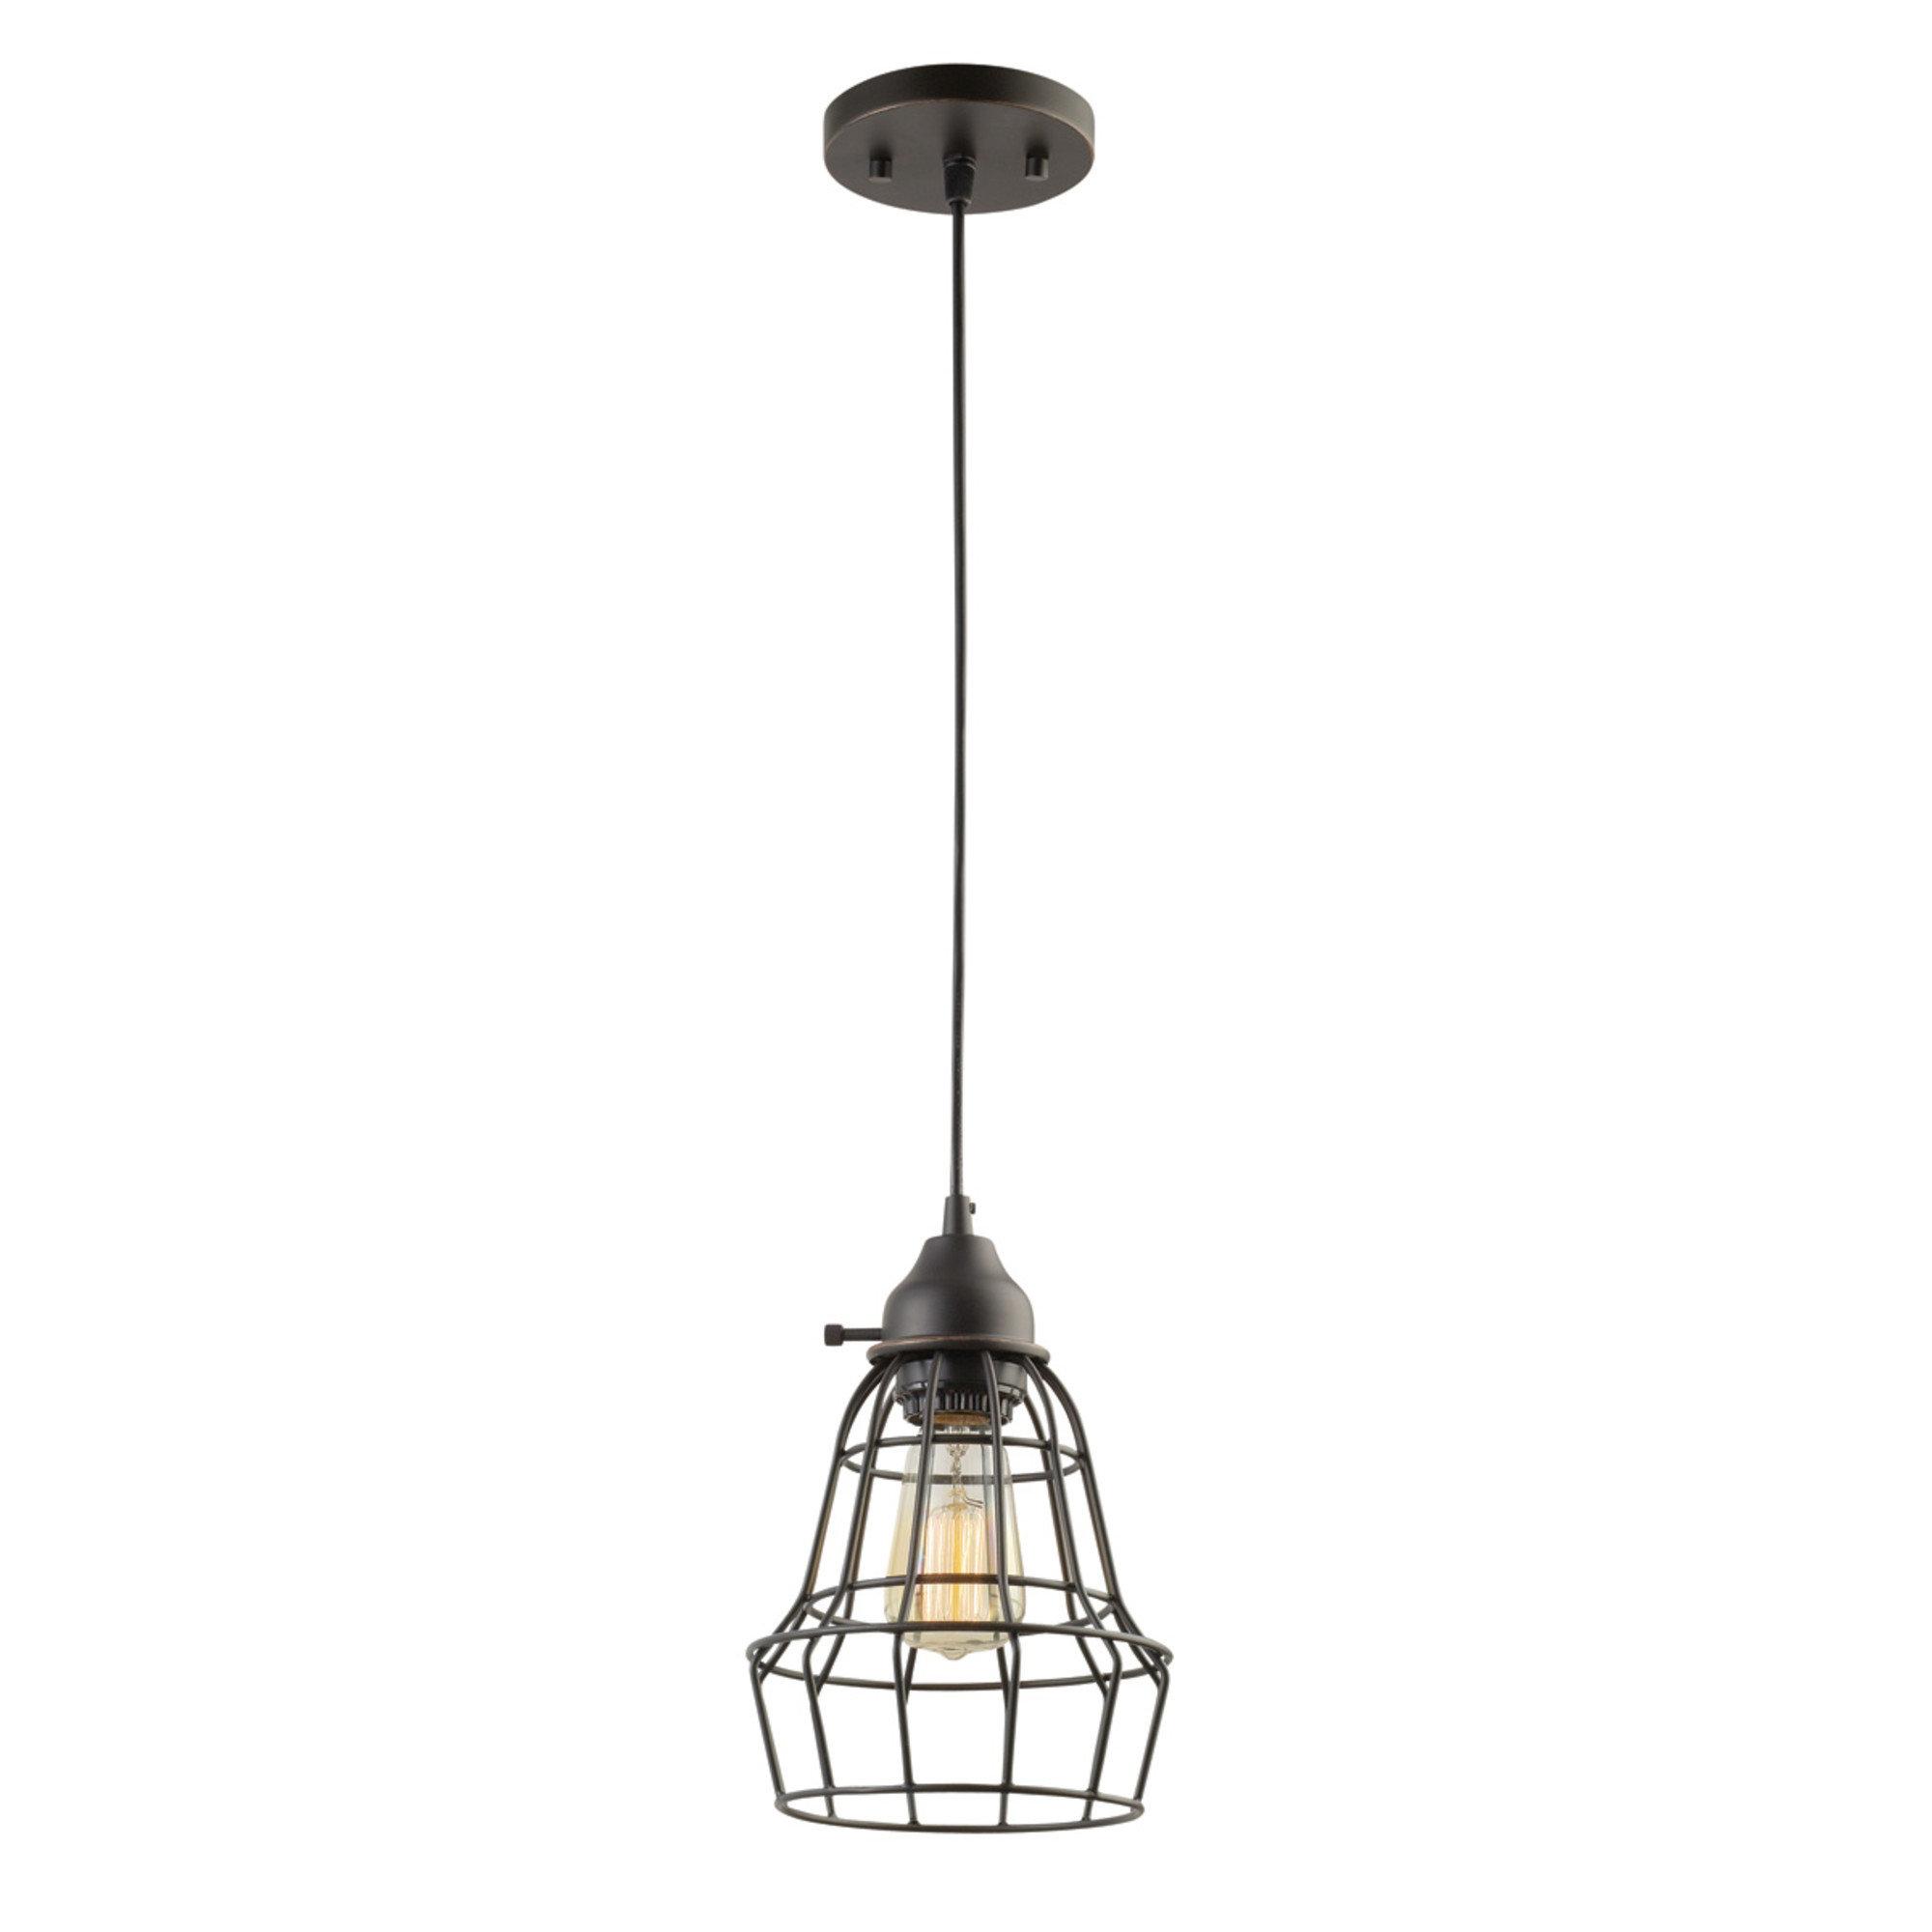 Kathi 1 Light Lantern Pendant With Regard To Well Known Vintage Edison 1 Light Bowl Pendants (Gallery 17 of 25)